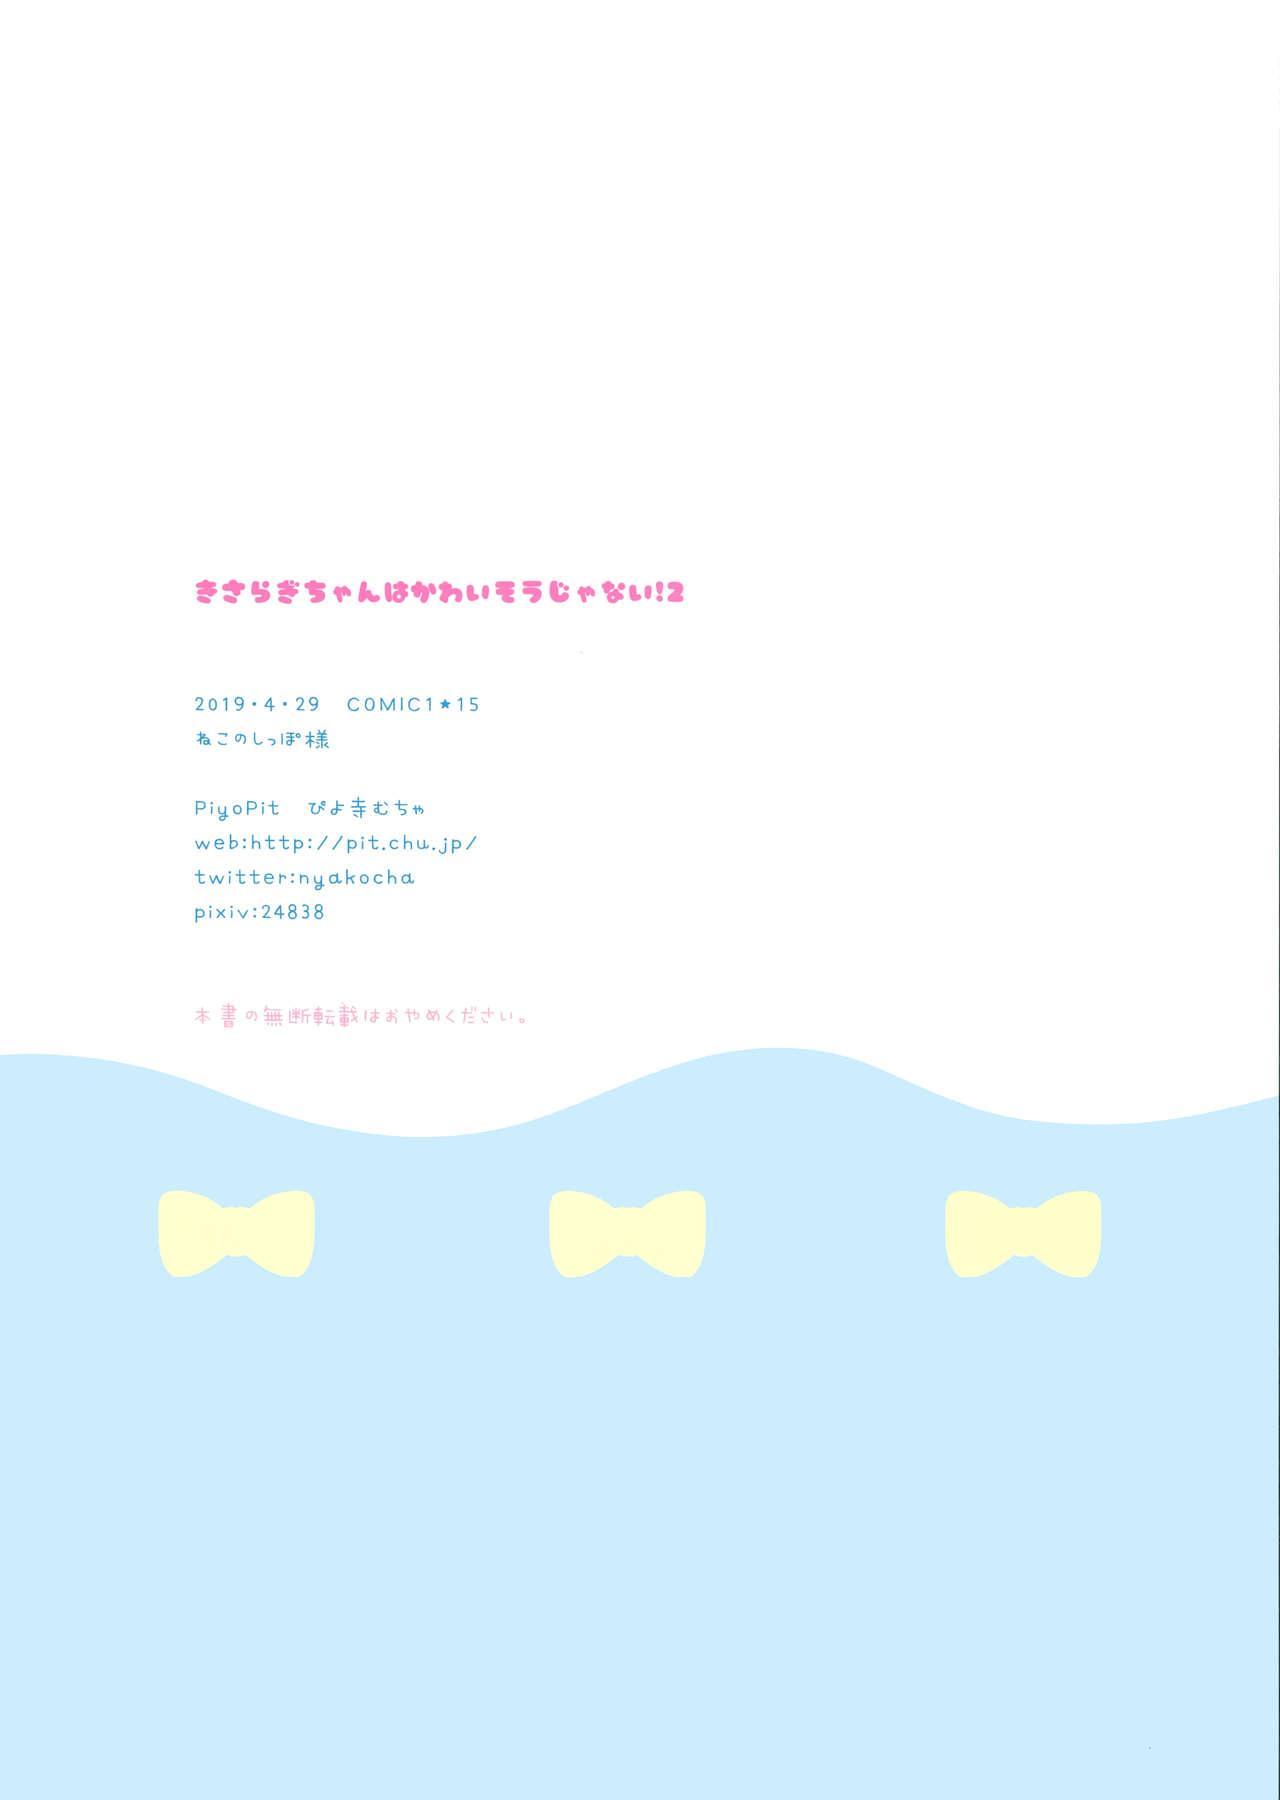 (COMIC1☆15) [PiyoPit (Piyodera Mucha)] Kisaragi-chan wa Kawaisou ja Nai!2 - Kisaragi-chan is not pitiful!2 (Azur Lane) [English] 12